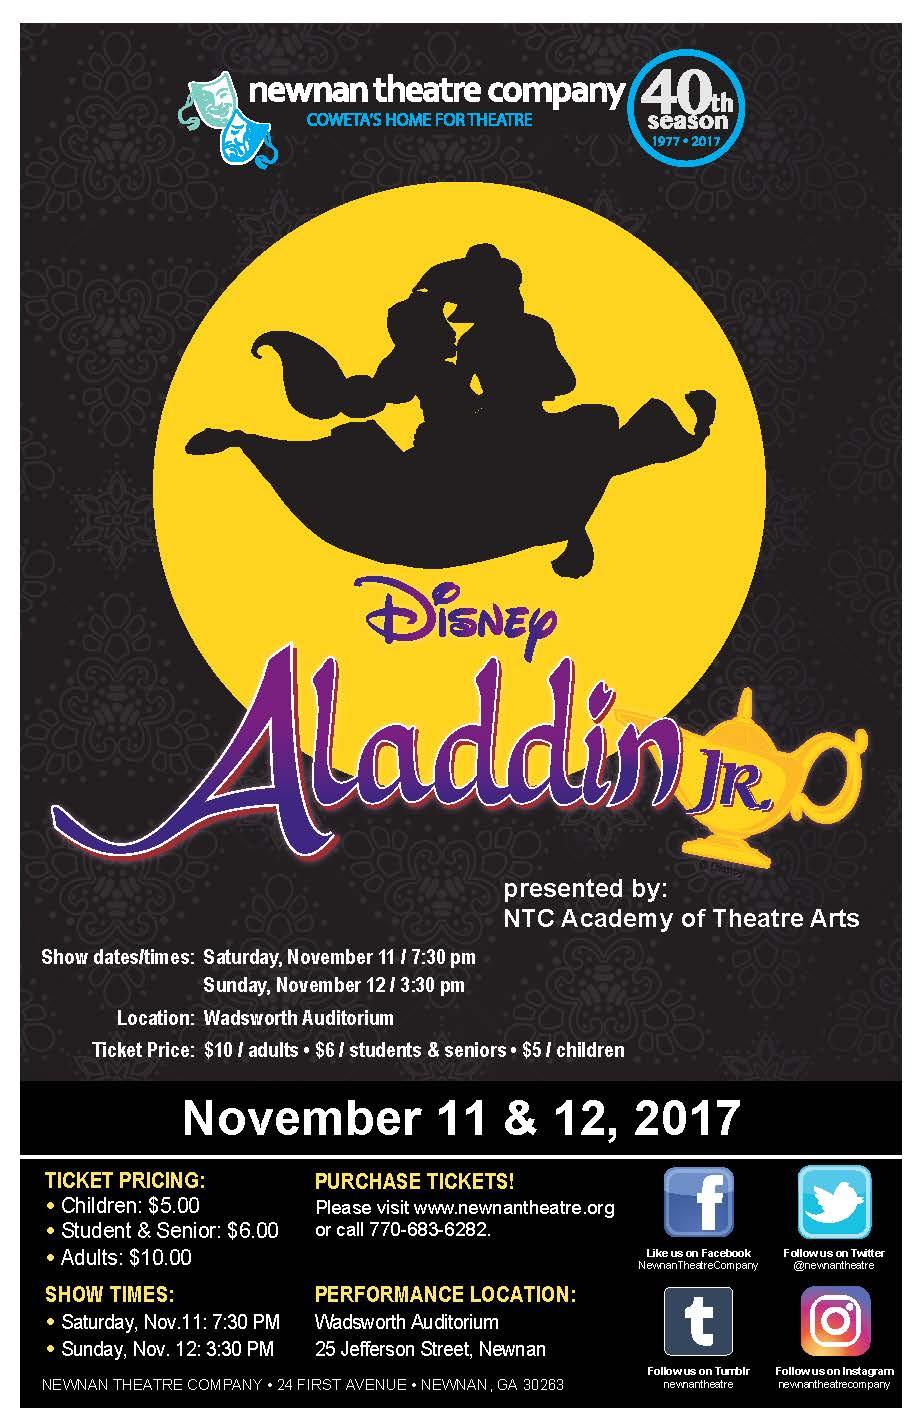 Aladdin poster 11x17.jpg